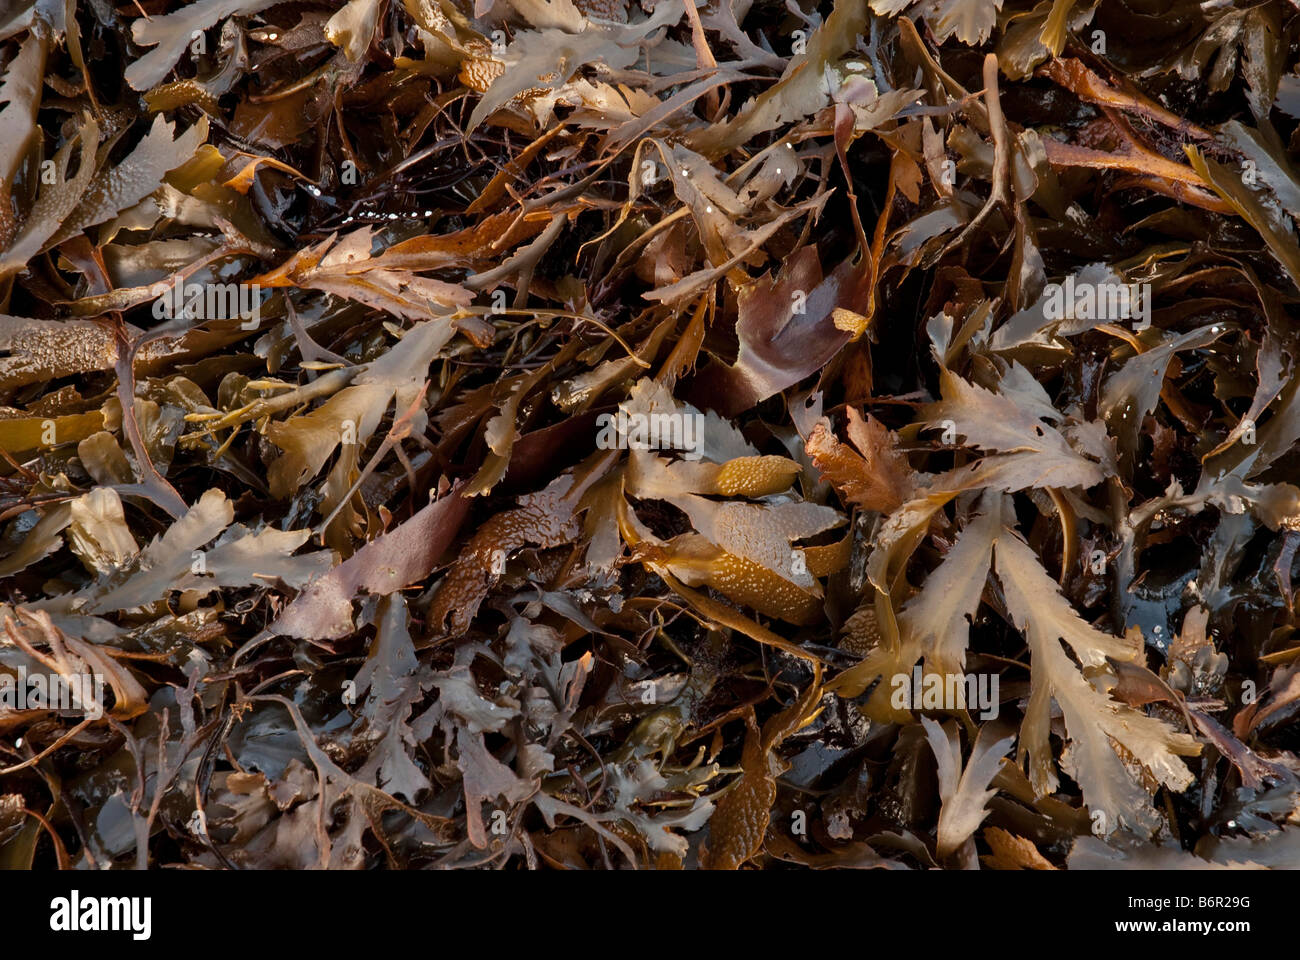 Brown Seaweeds - Stock Image